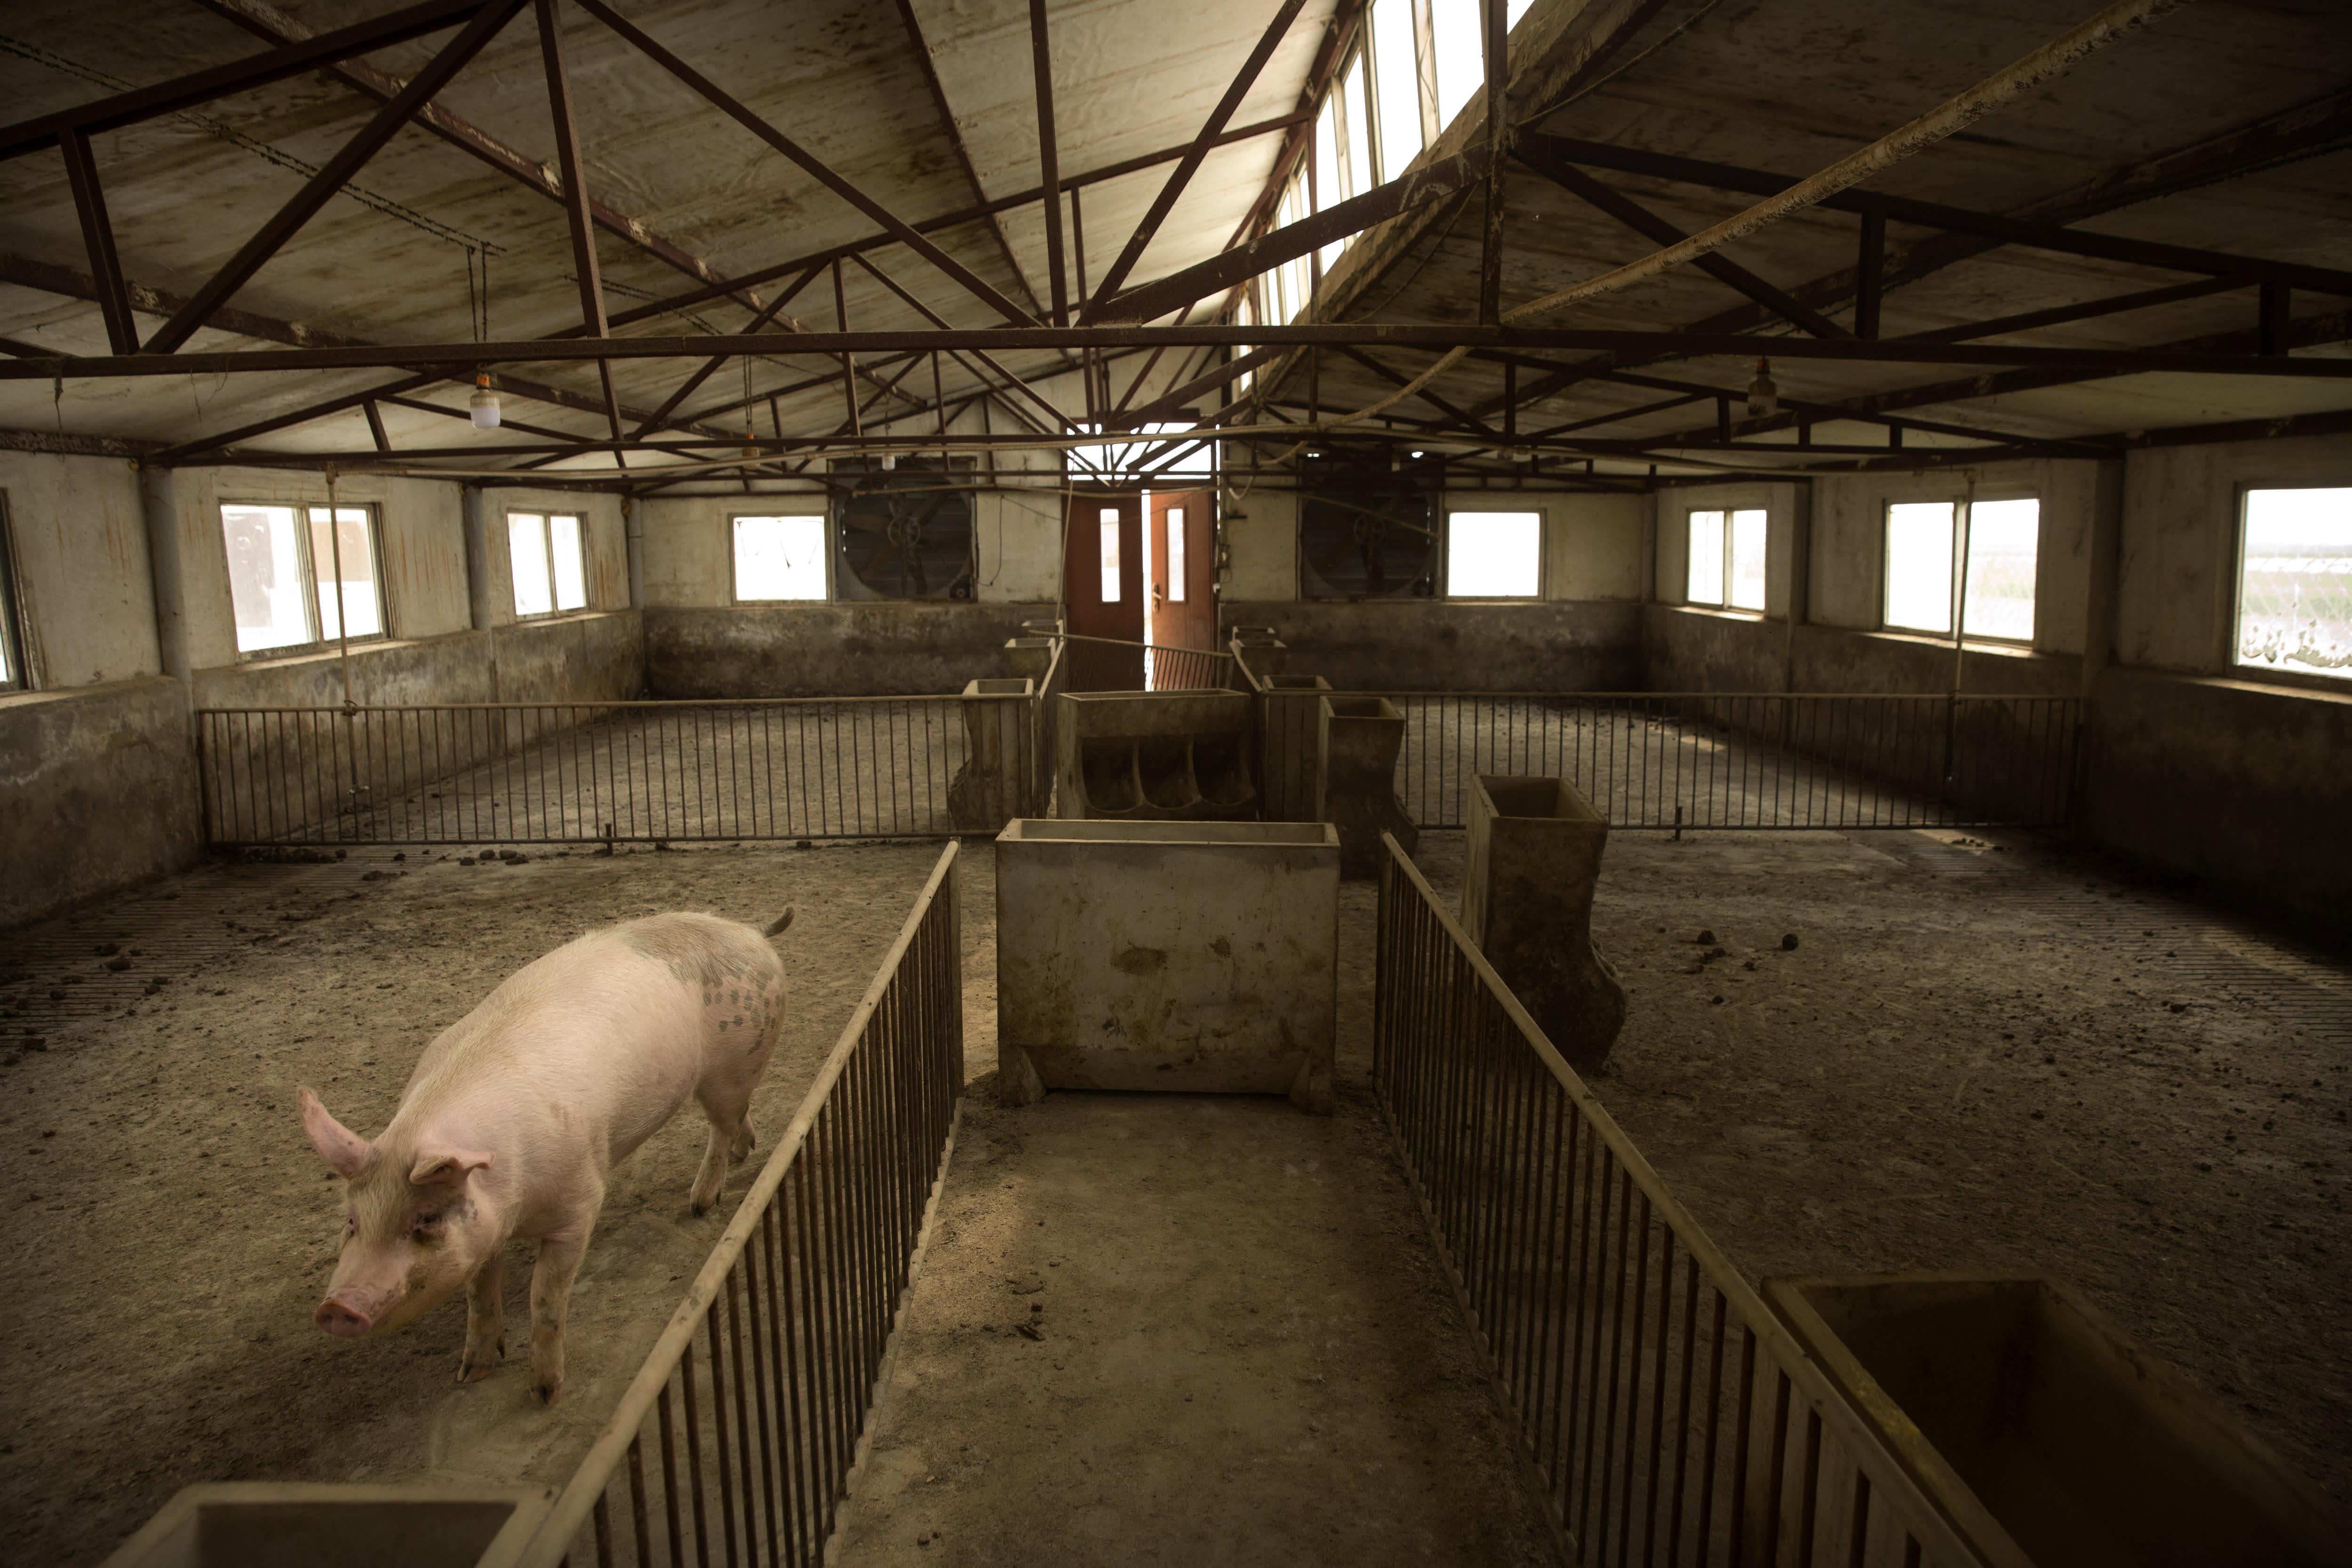 China reports African swine fever outbreak in Gansu...